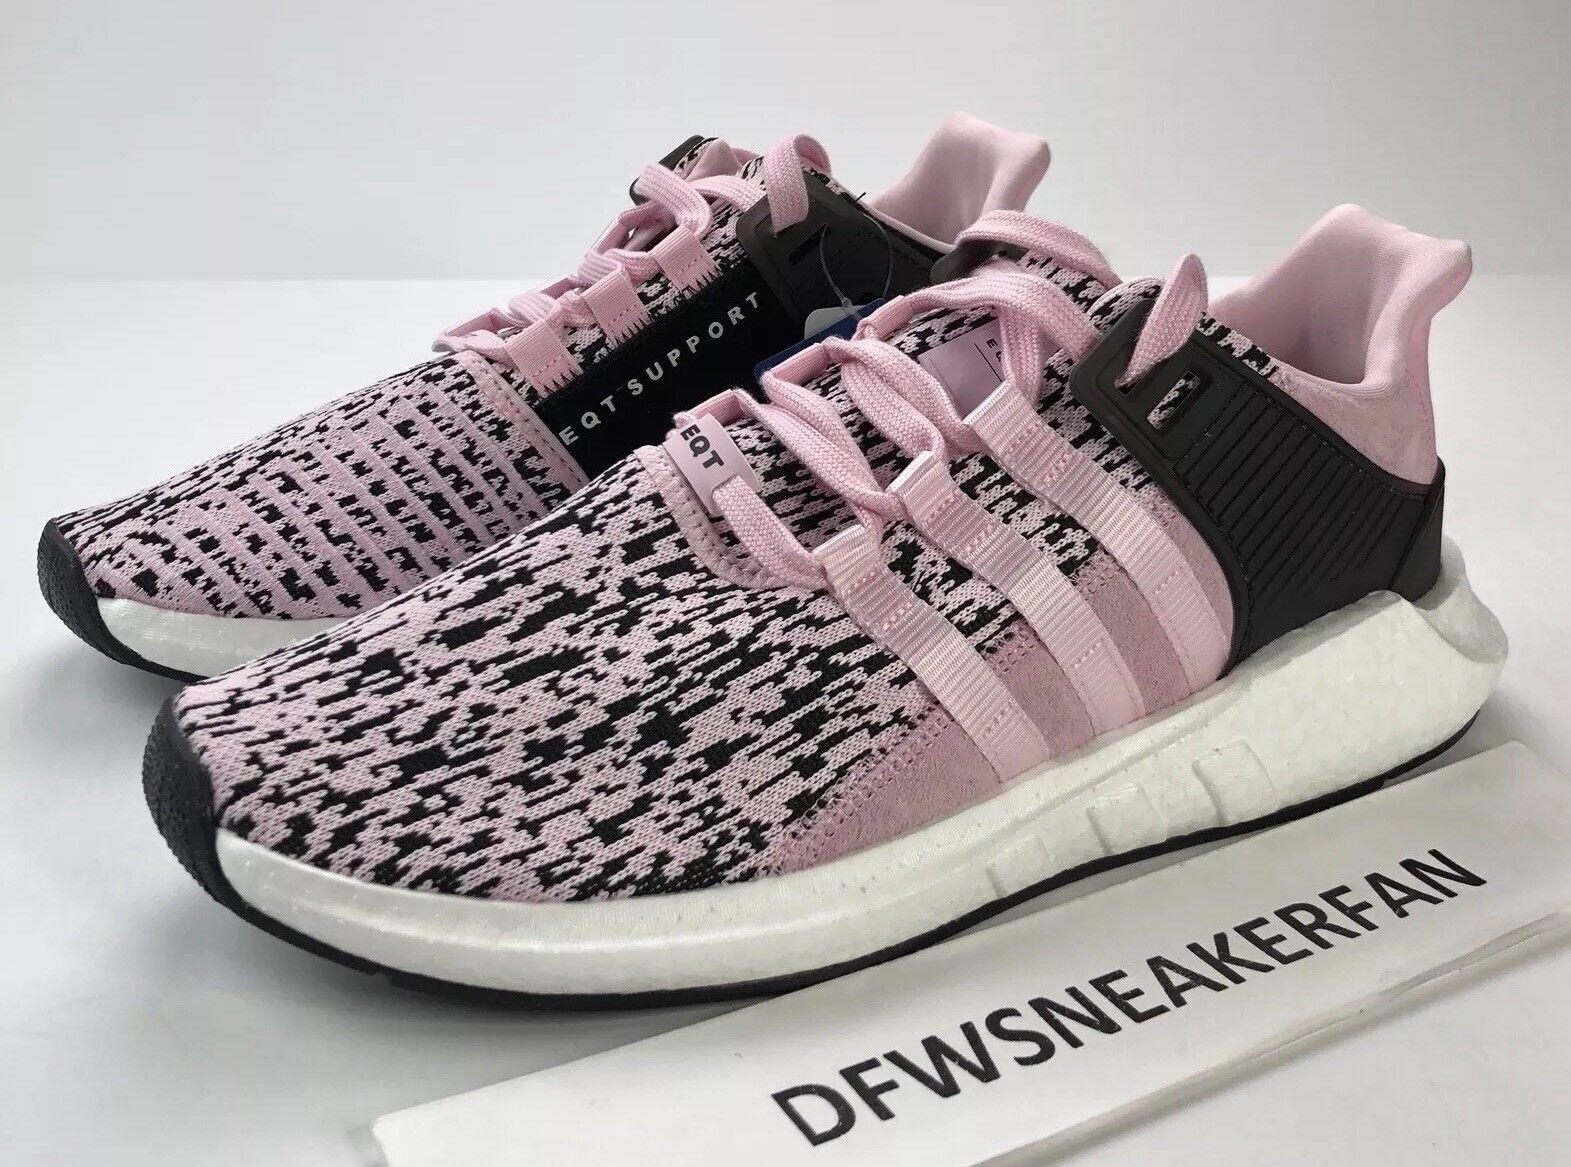 Adidas EQT Support 93/17 BOOST Uomo Size 12 Primeknit Pink Glitch Camo PK BZ0583